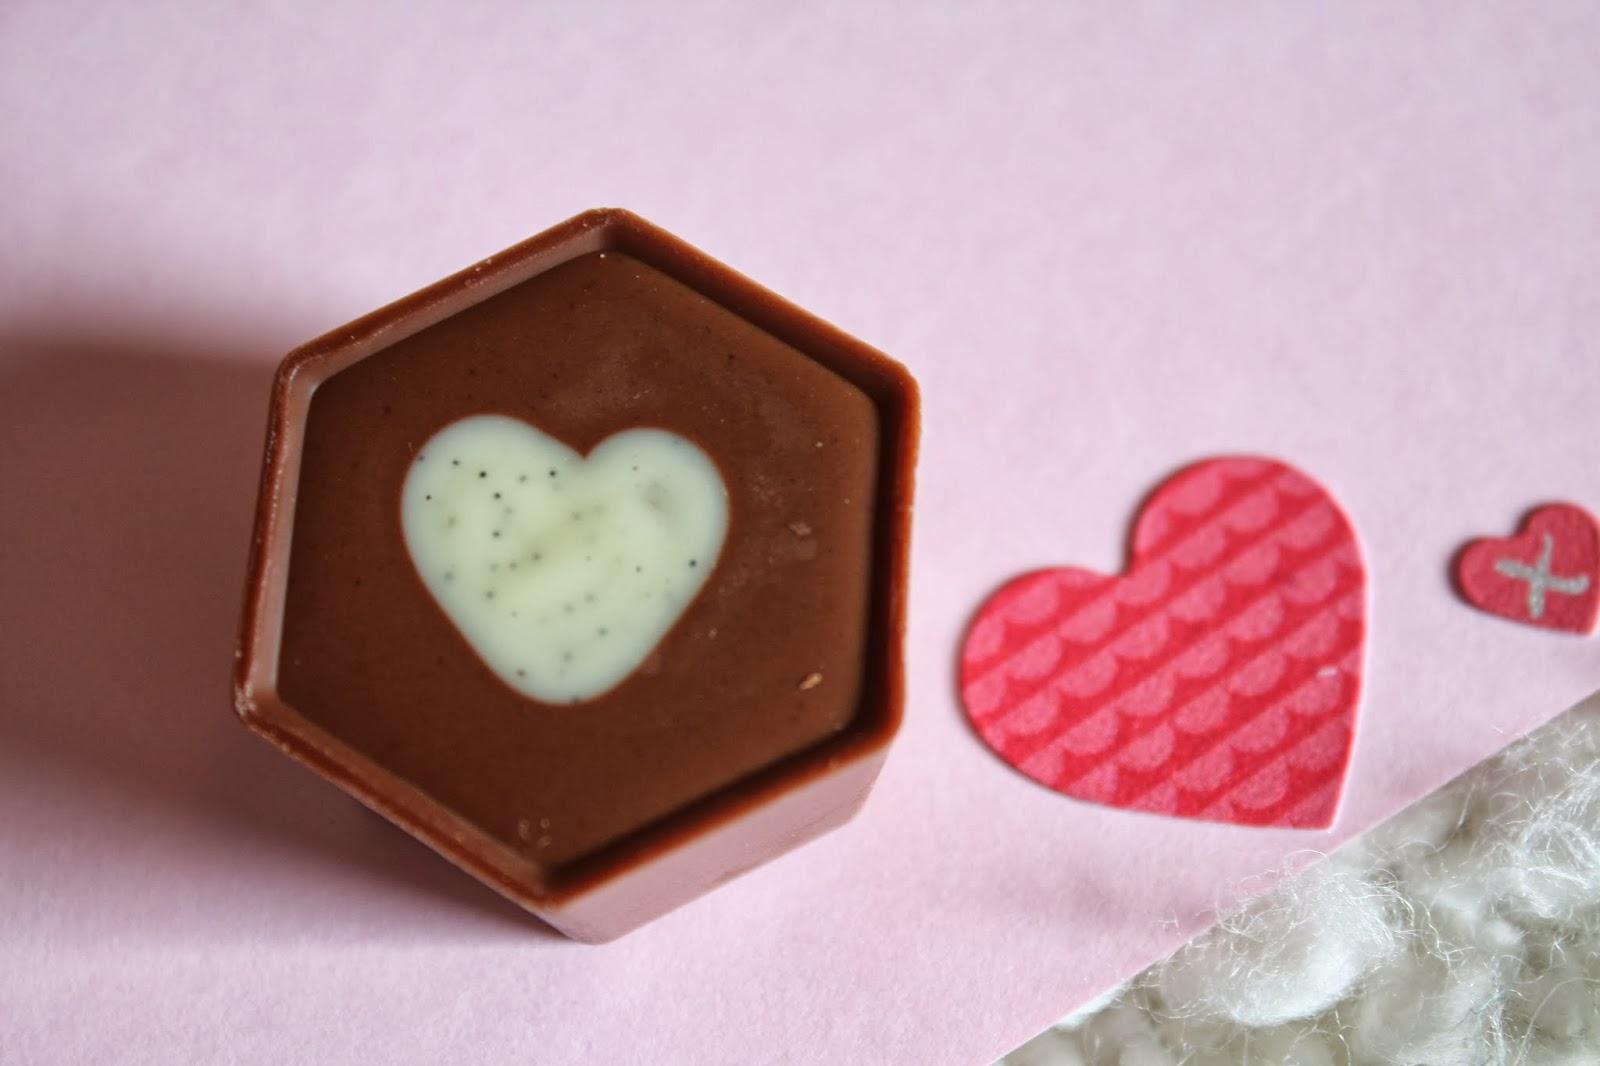 Hotel Chocolat Heart